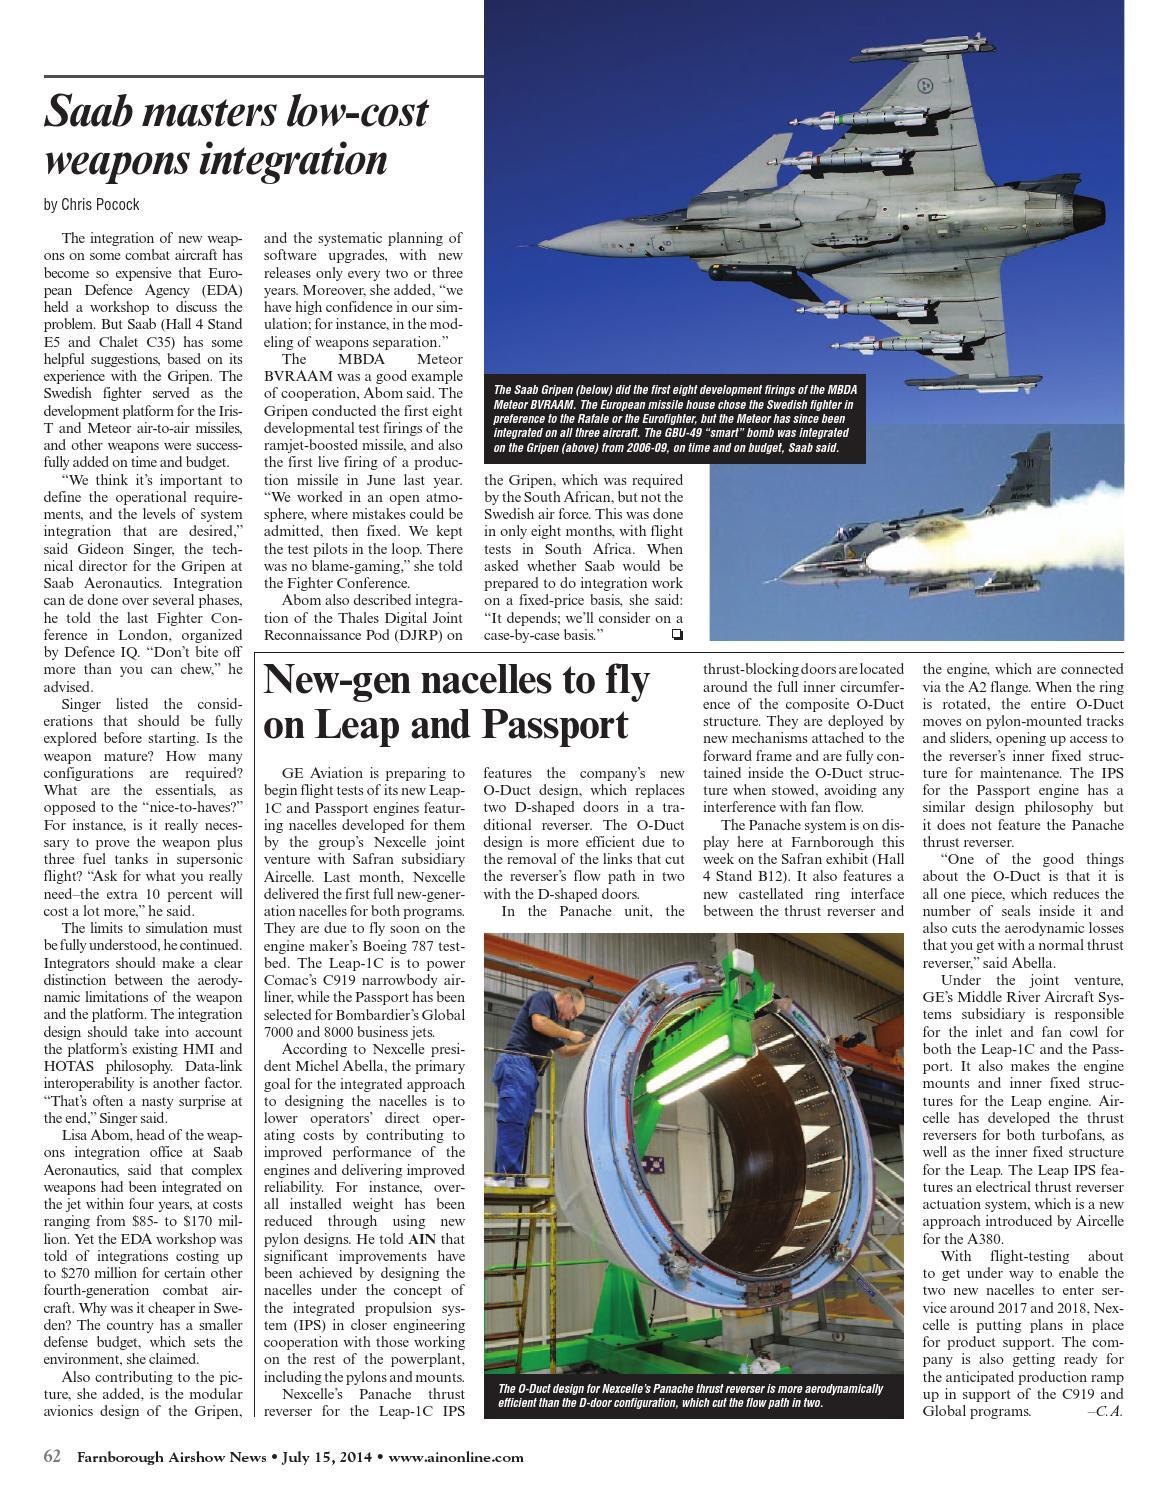 Farnborough Airshow News 07-15-14 by Aviation International News - issuu